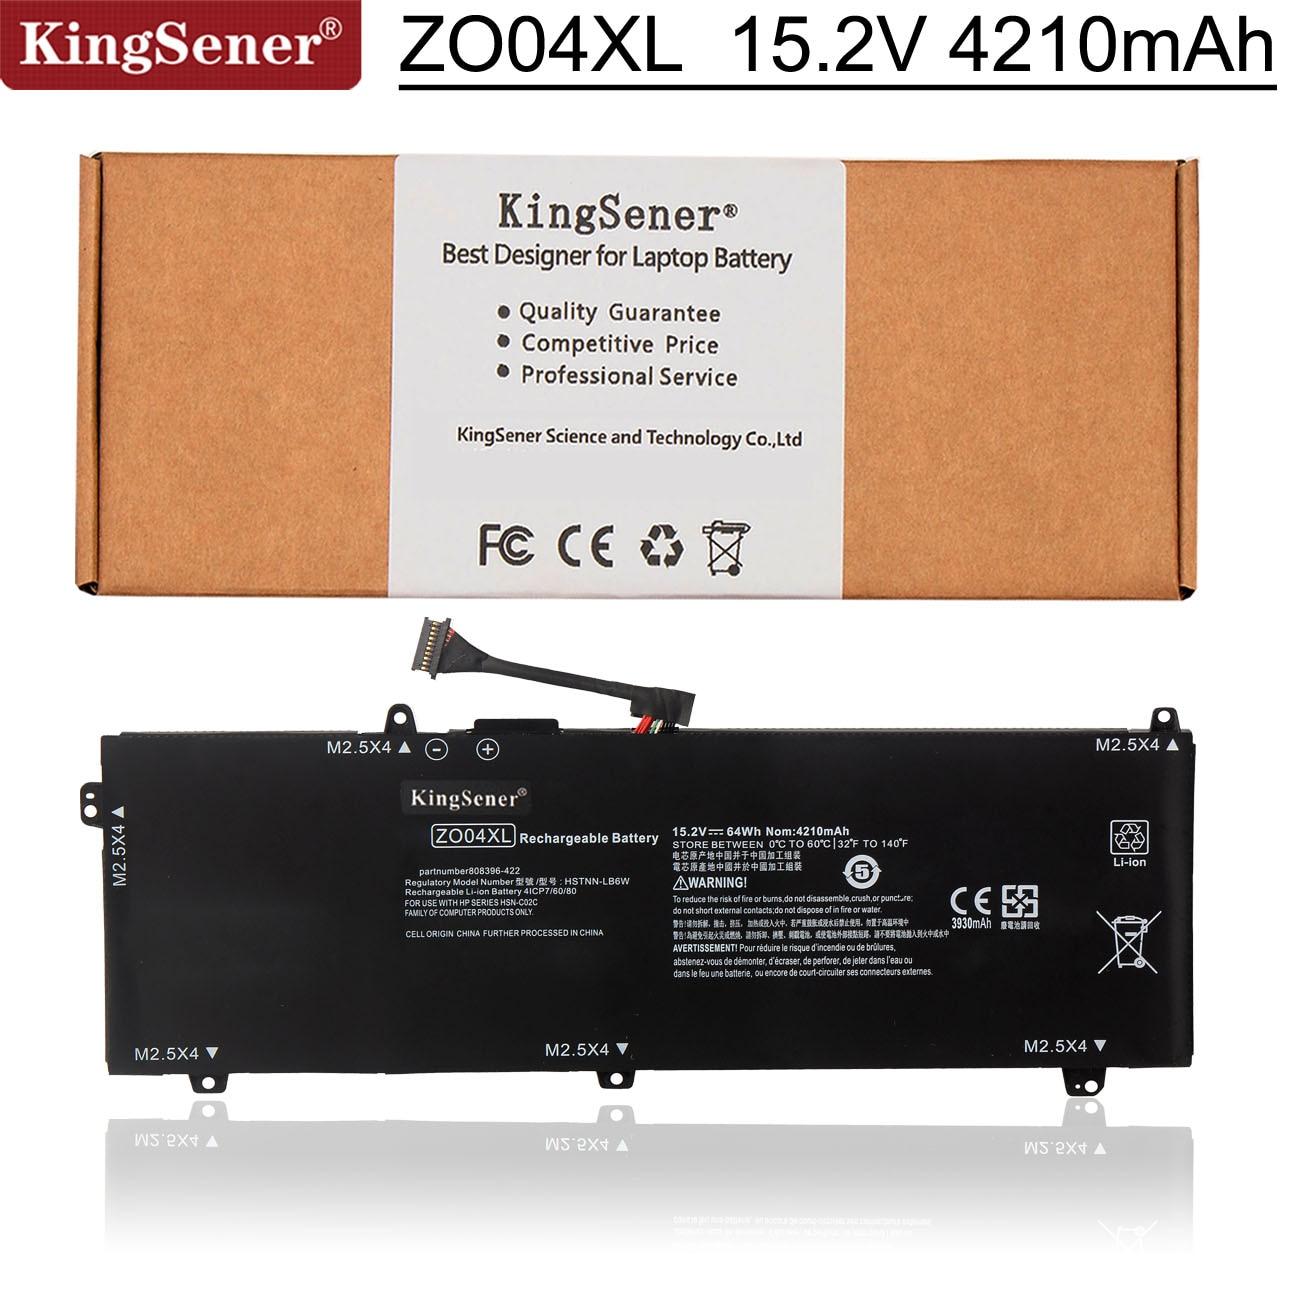 Kingsener 15.2V 64Wh ZO04XL محمول بطارية لجهاز HP ZBook استوديو G3 G4 808396-421 808450-001 HSTNN-CS8C HSTNN-C88C HSTNN-LB6W ZO04